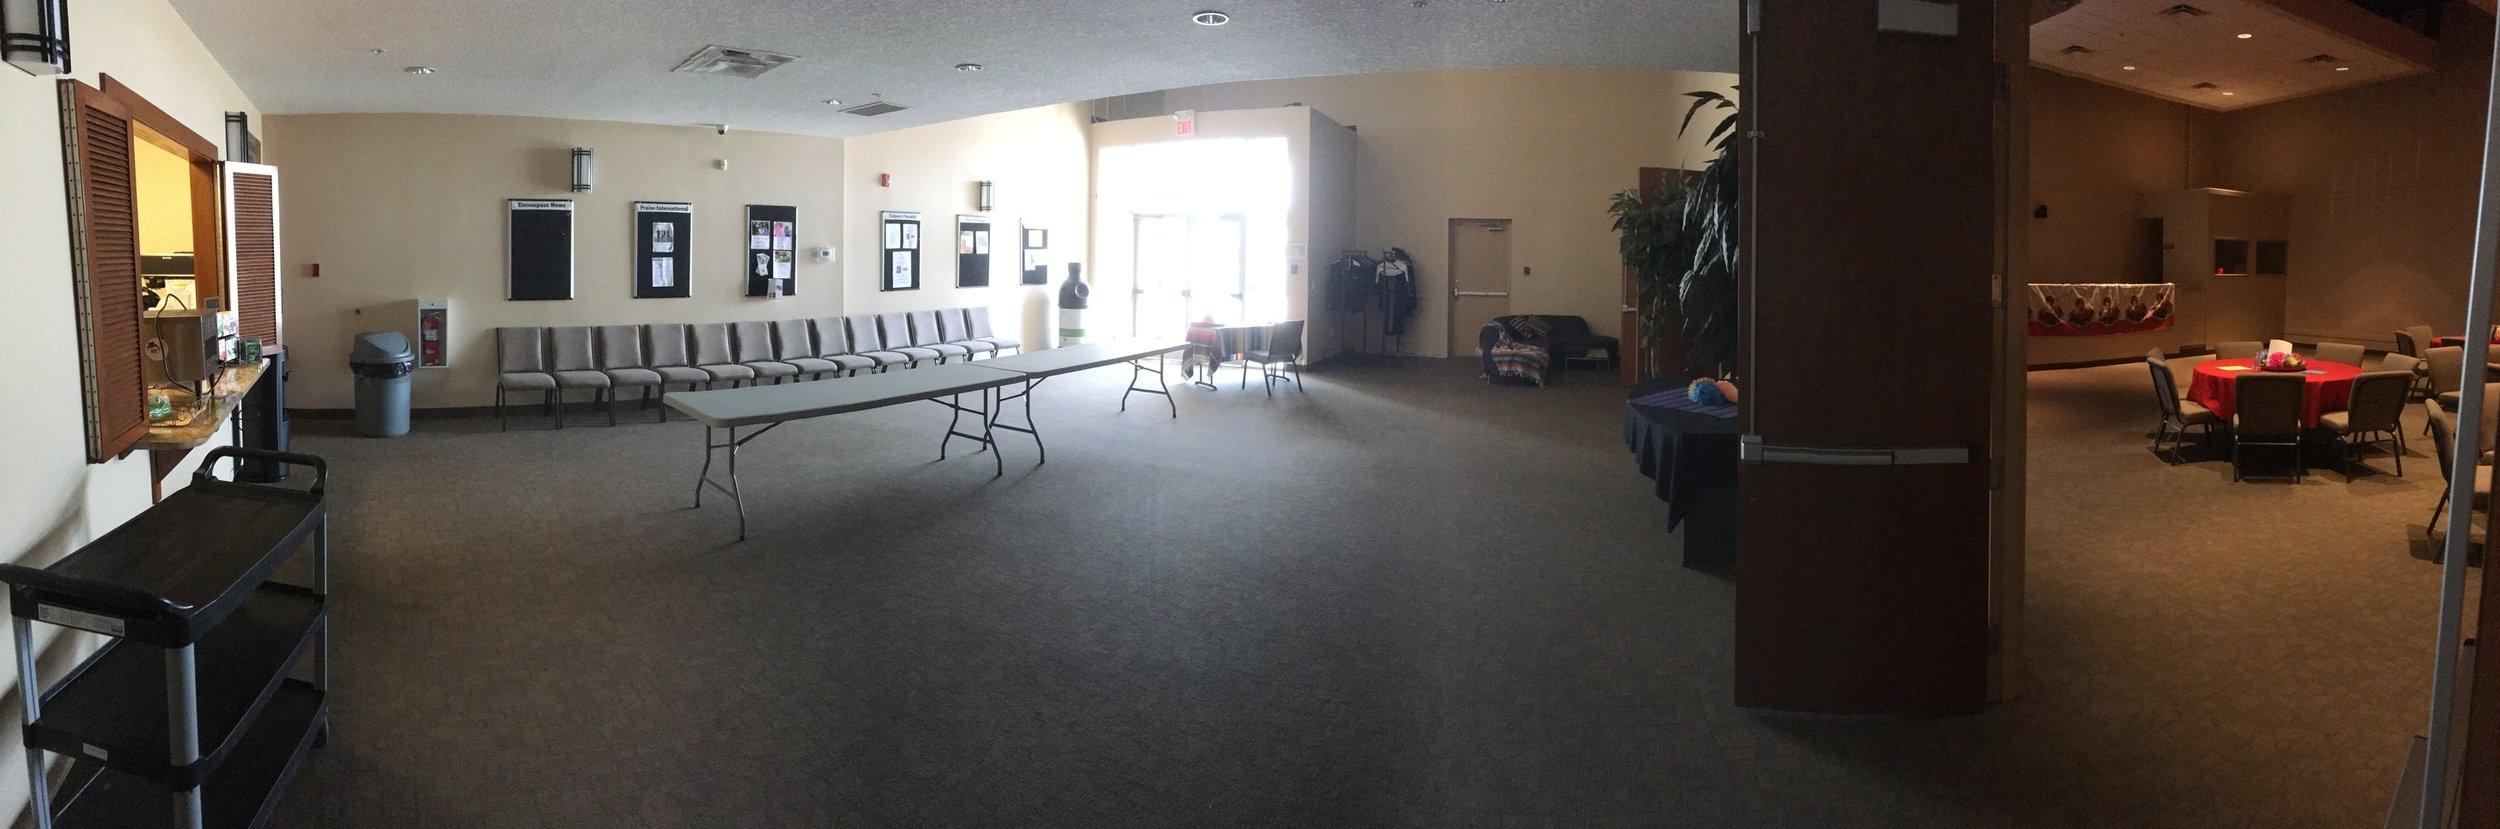 Foyer - AuditoriumJPG.jpg